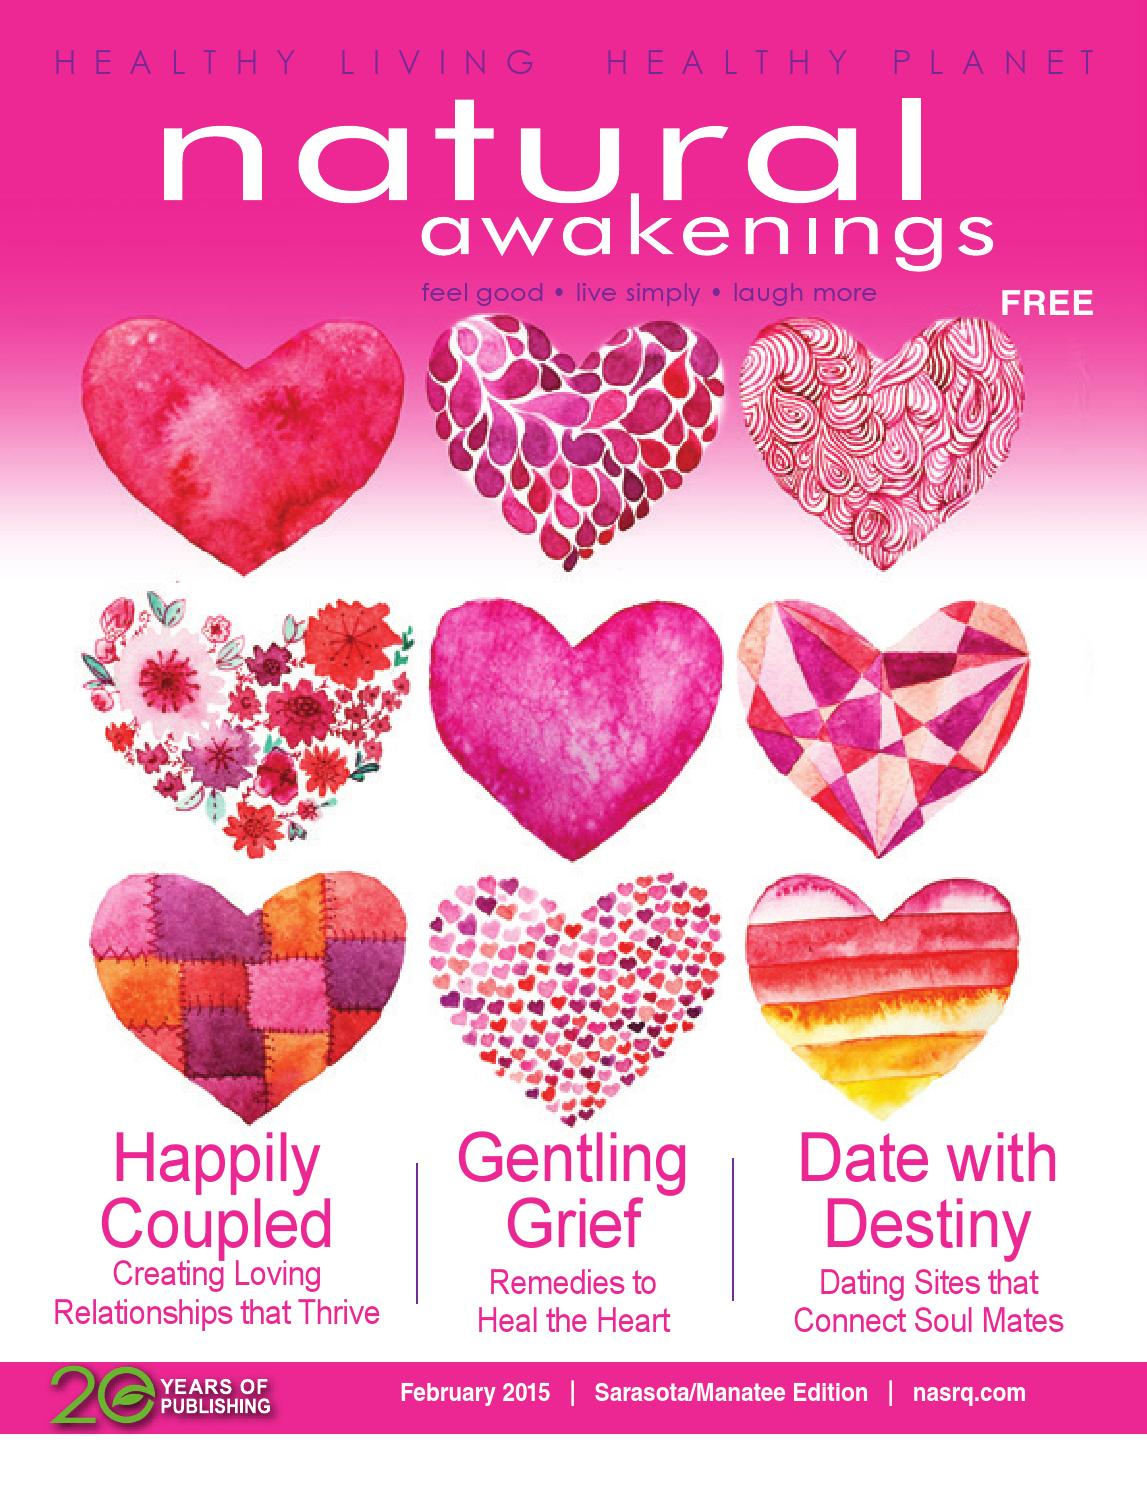 Dr sayer awakenings essay